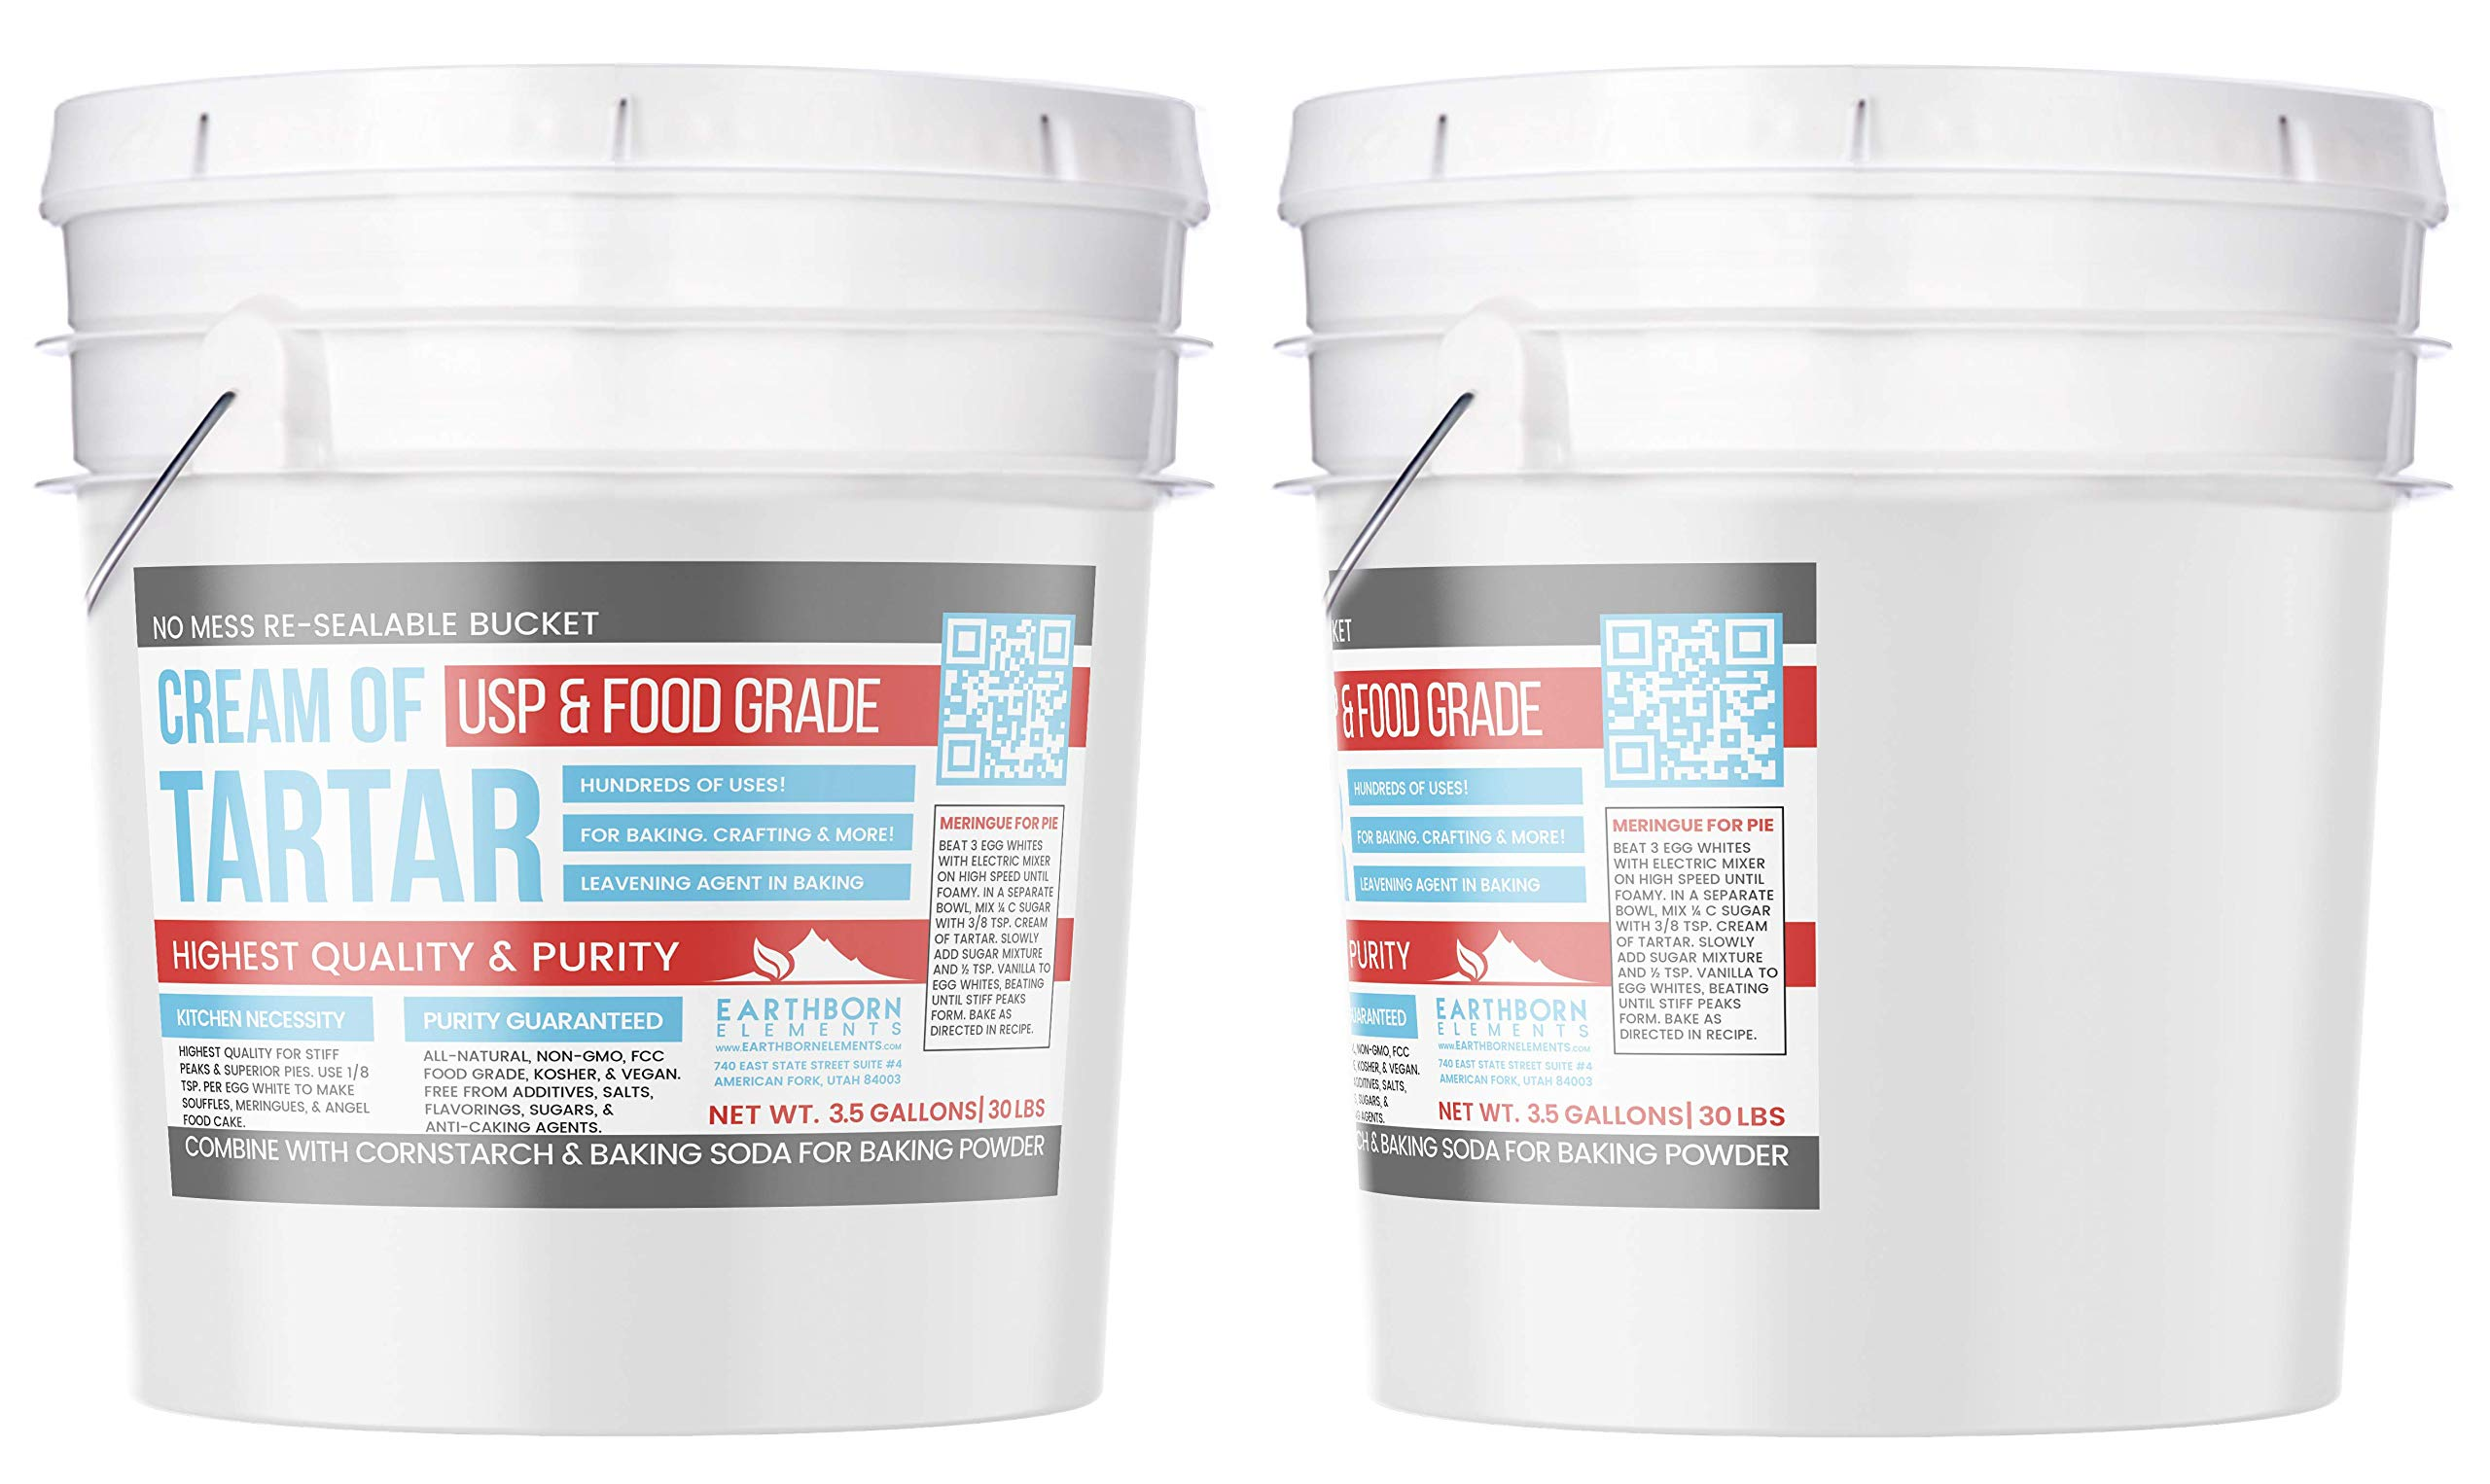 Cream of Tartar (3.5 Gallon) by Earthborn Elements, Resealable Bucket, Highest Purity, Baking Additive, Non-GMO, Kosher, Gluten-Free, All-Natural, DIY Bath Bombs by Earthborn Elements (Image #3)